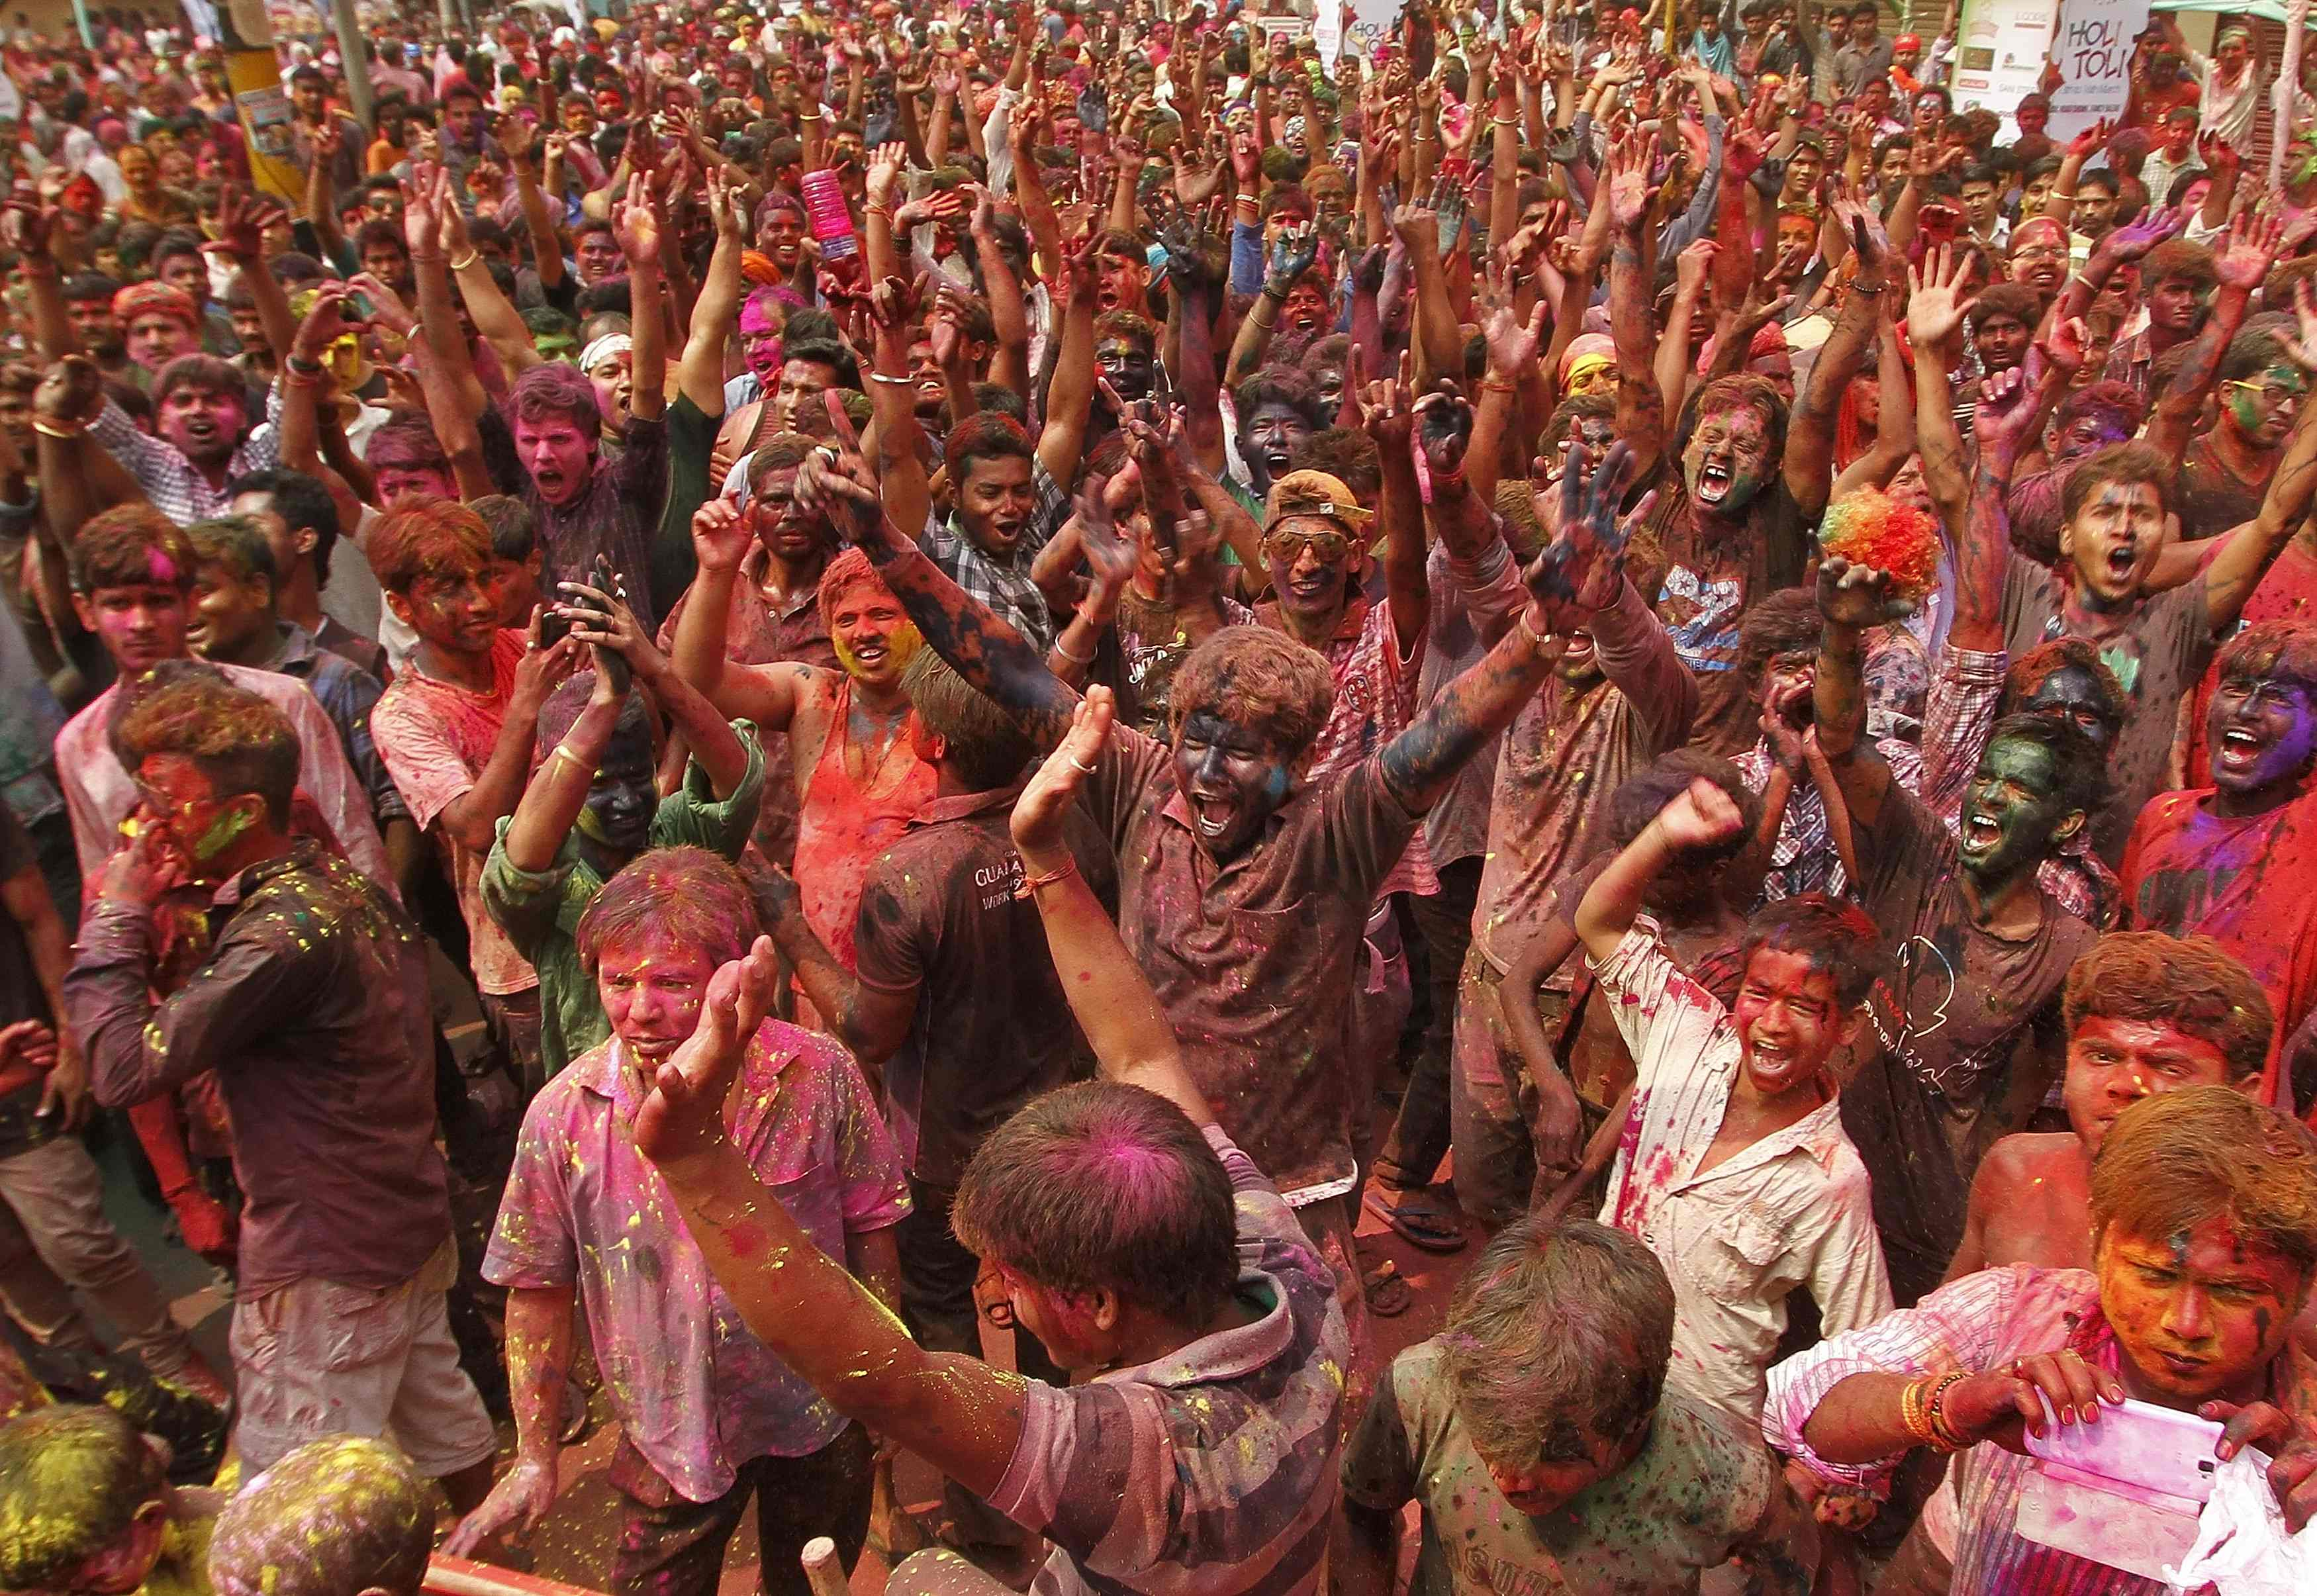 Festival de Cores comemorar a chegada da Primavera na Índia - Utpal Baruah/ Reuters